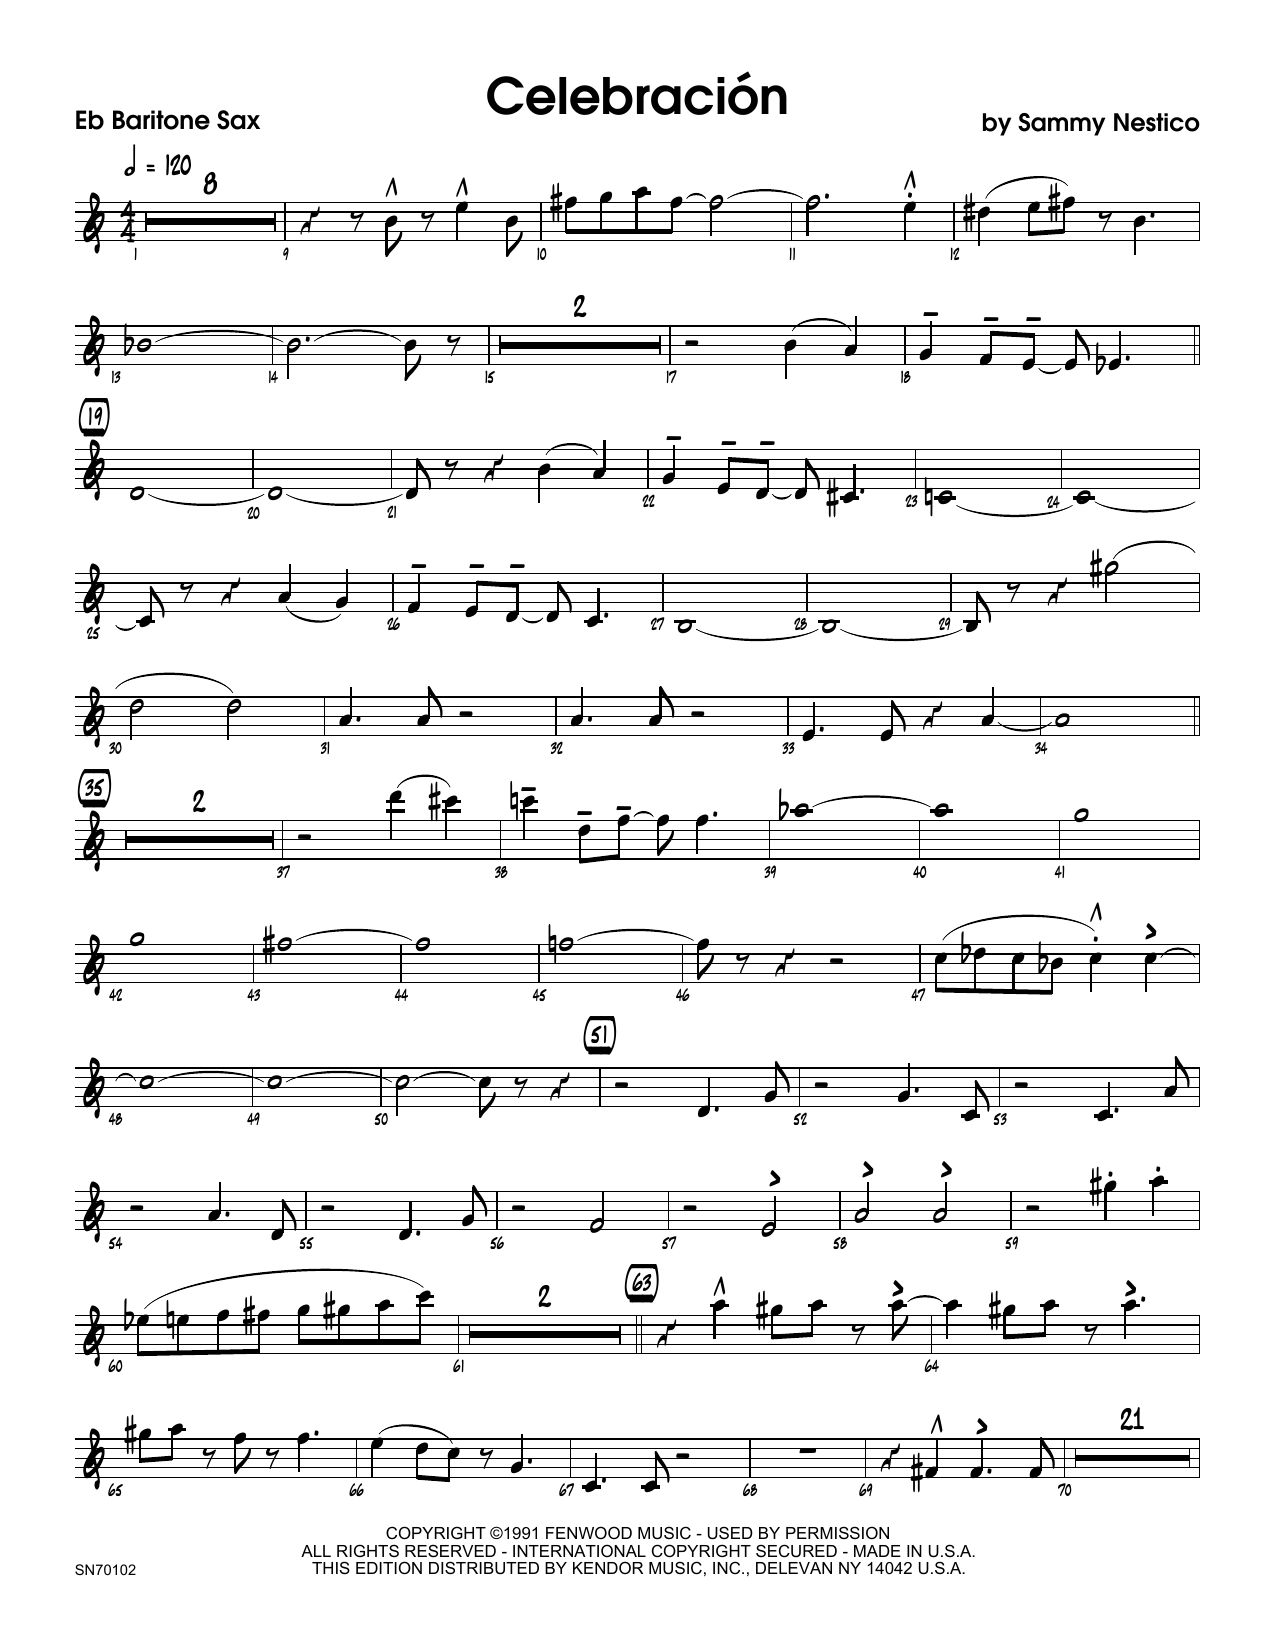 Celebracion - Eb Baritone Saxophone Sheet Music